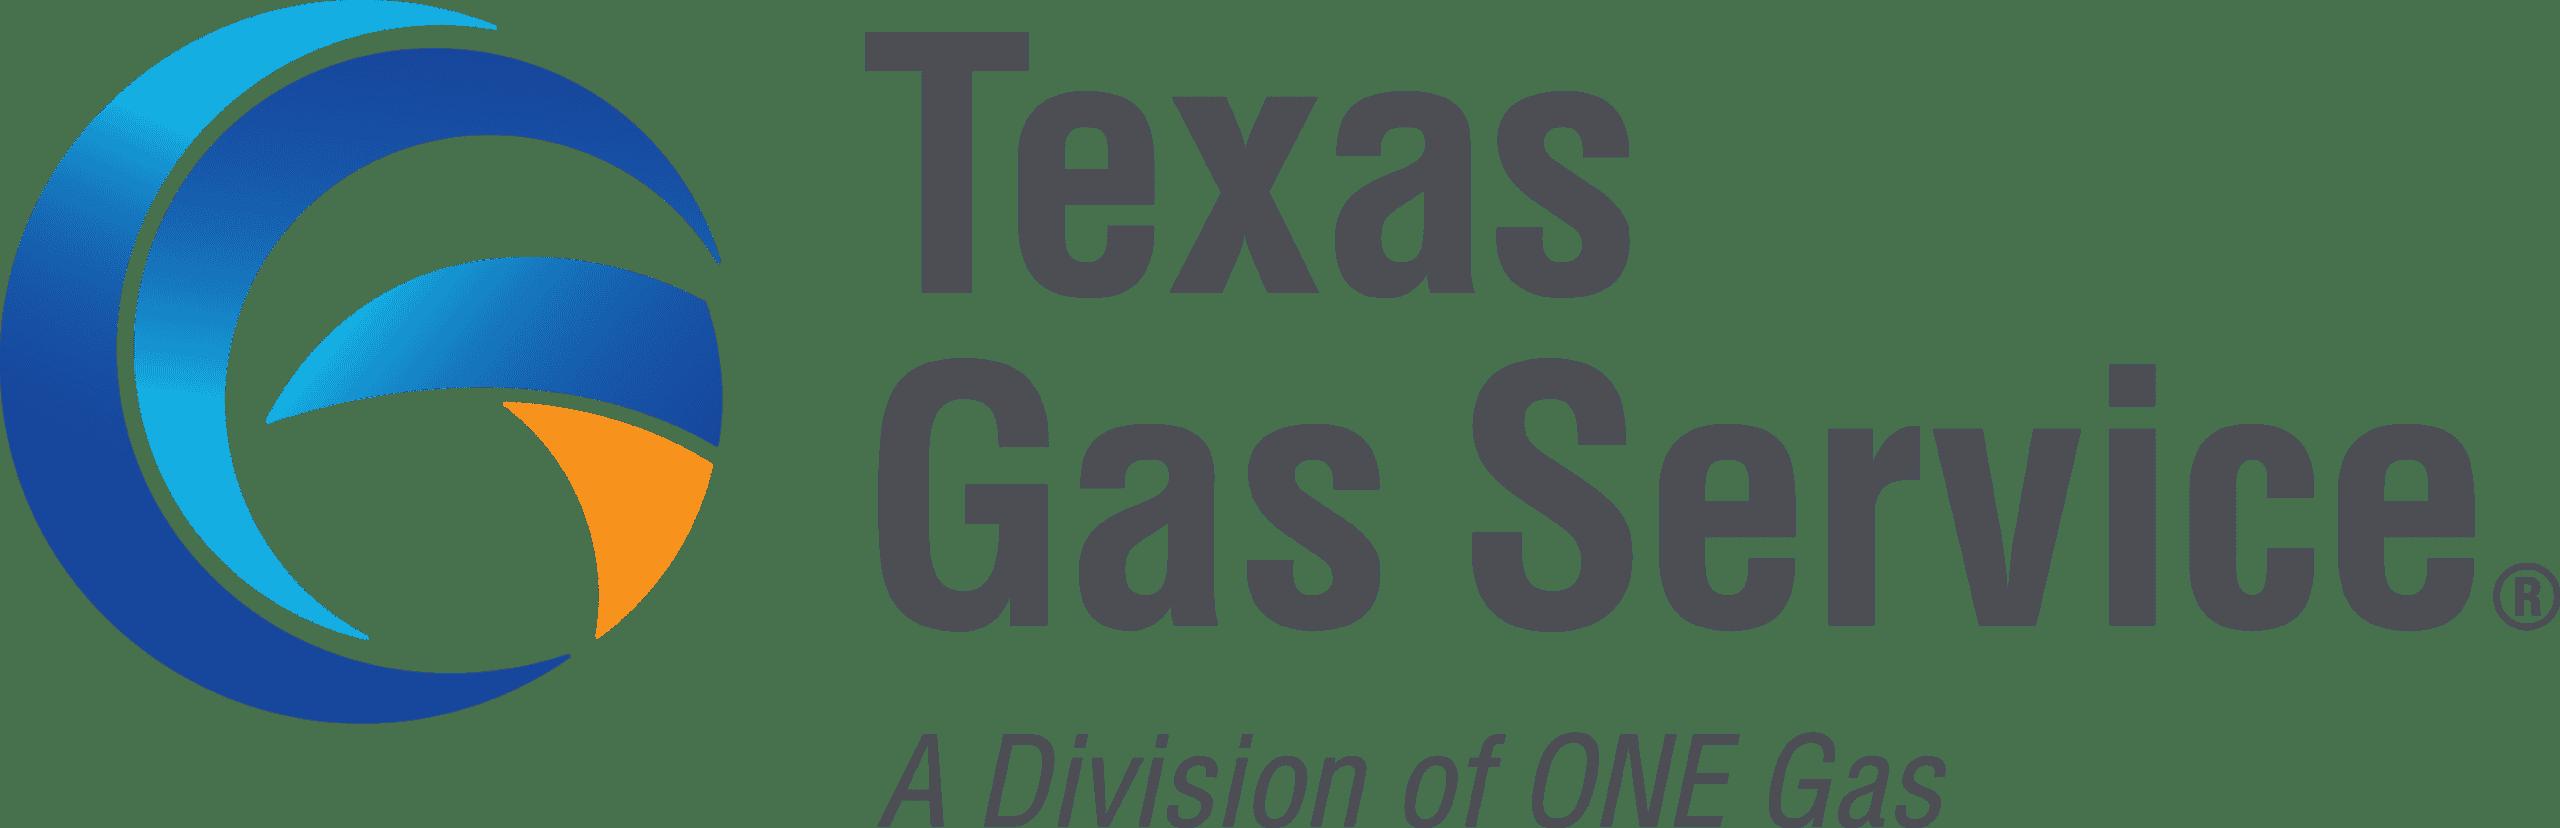 rgv new homes guide, rgv, mcallen, mission, edinburg, real estate, texas gas service